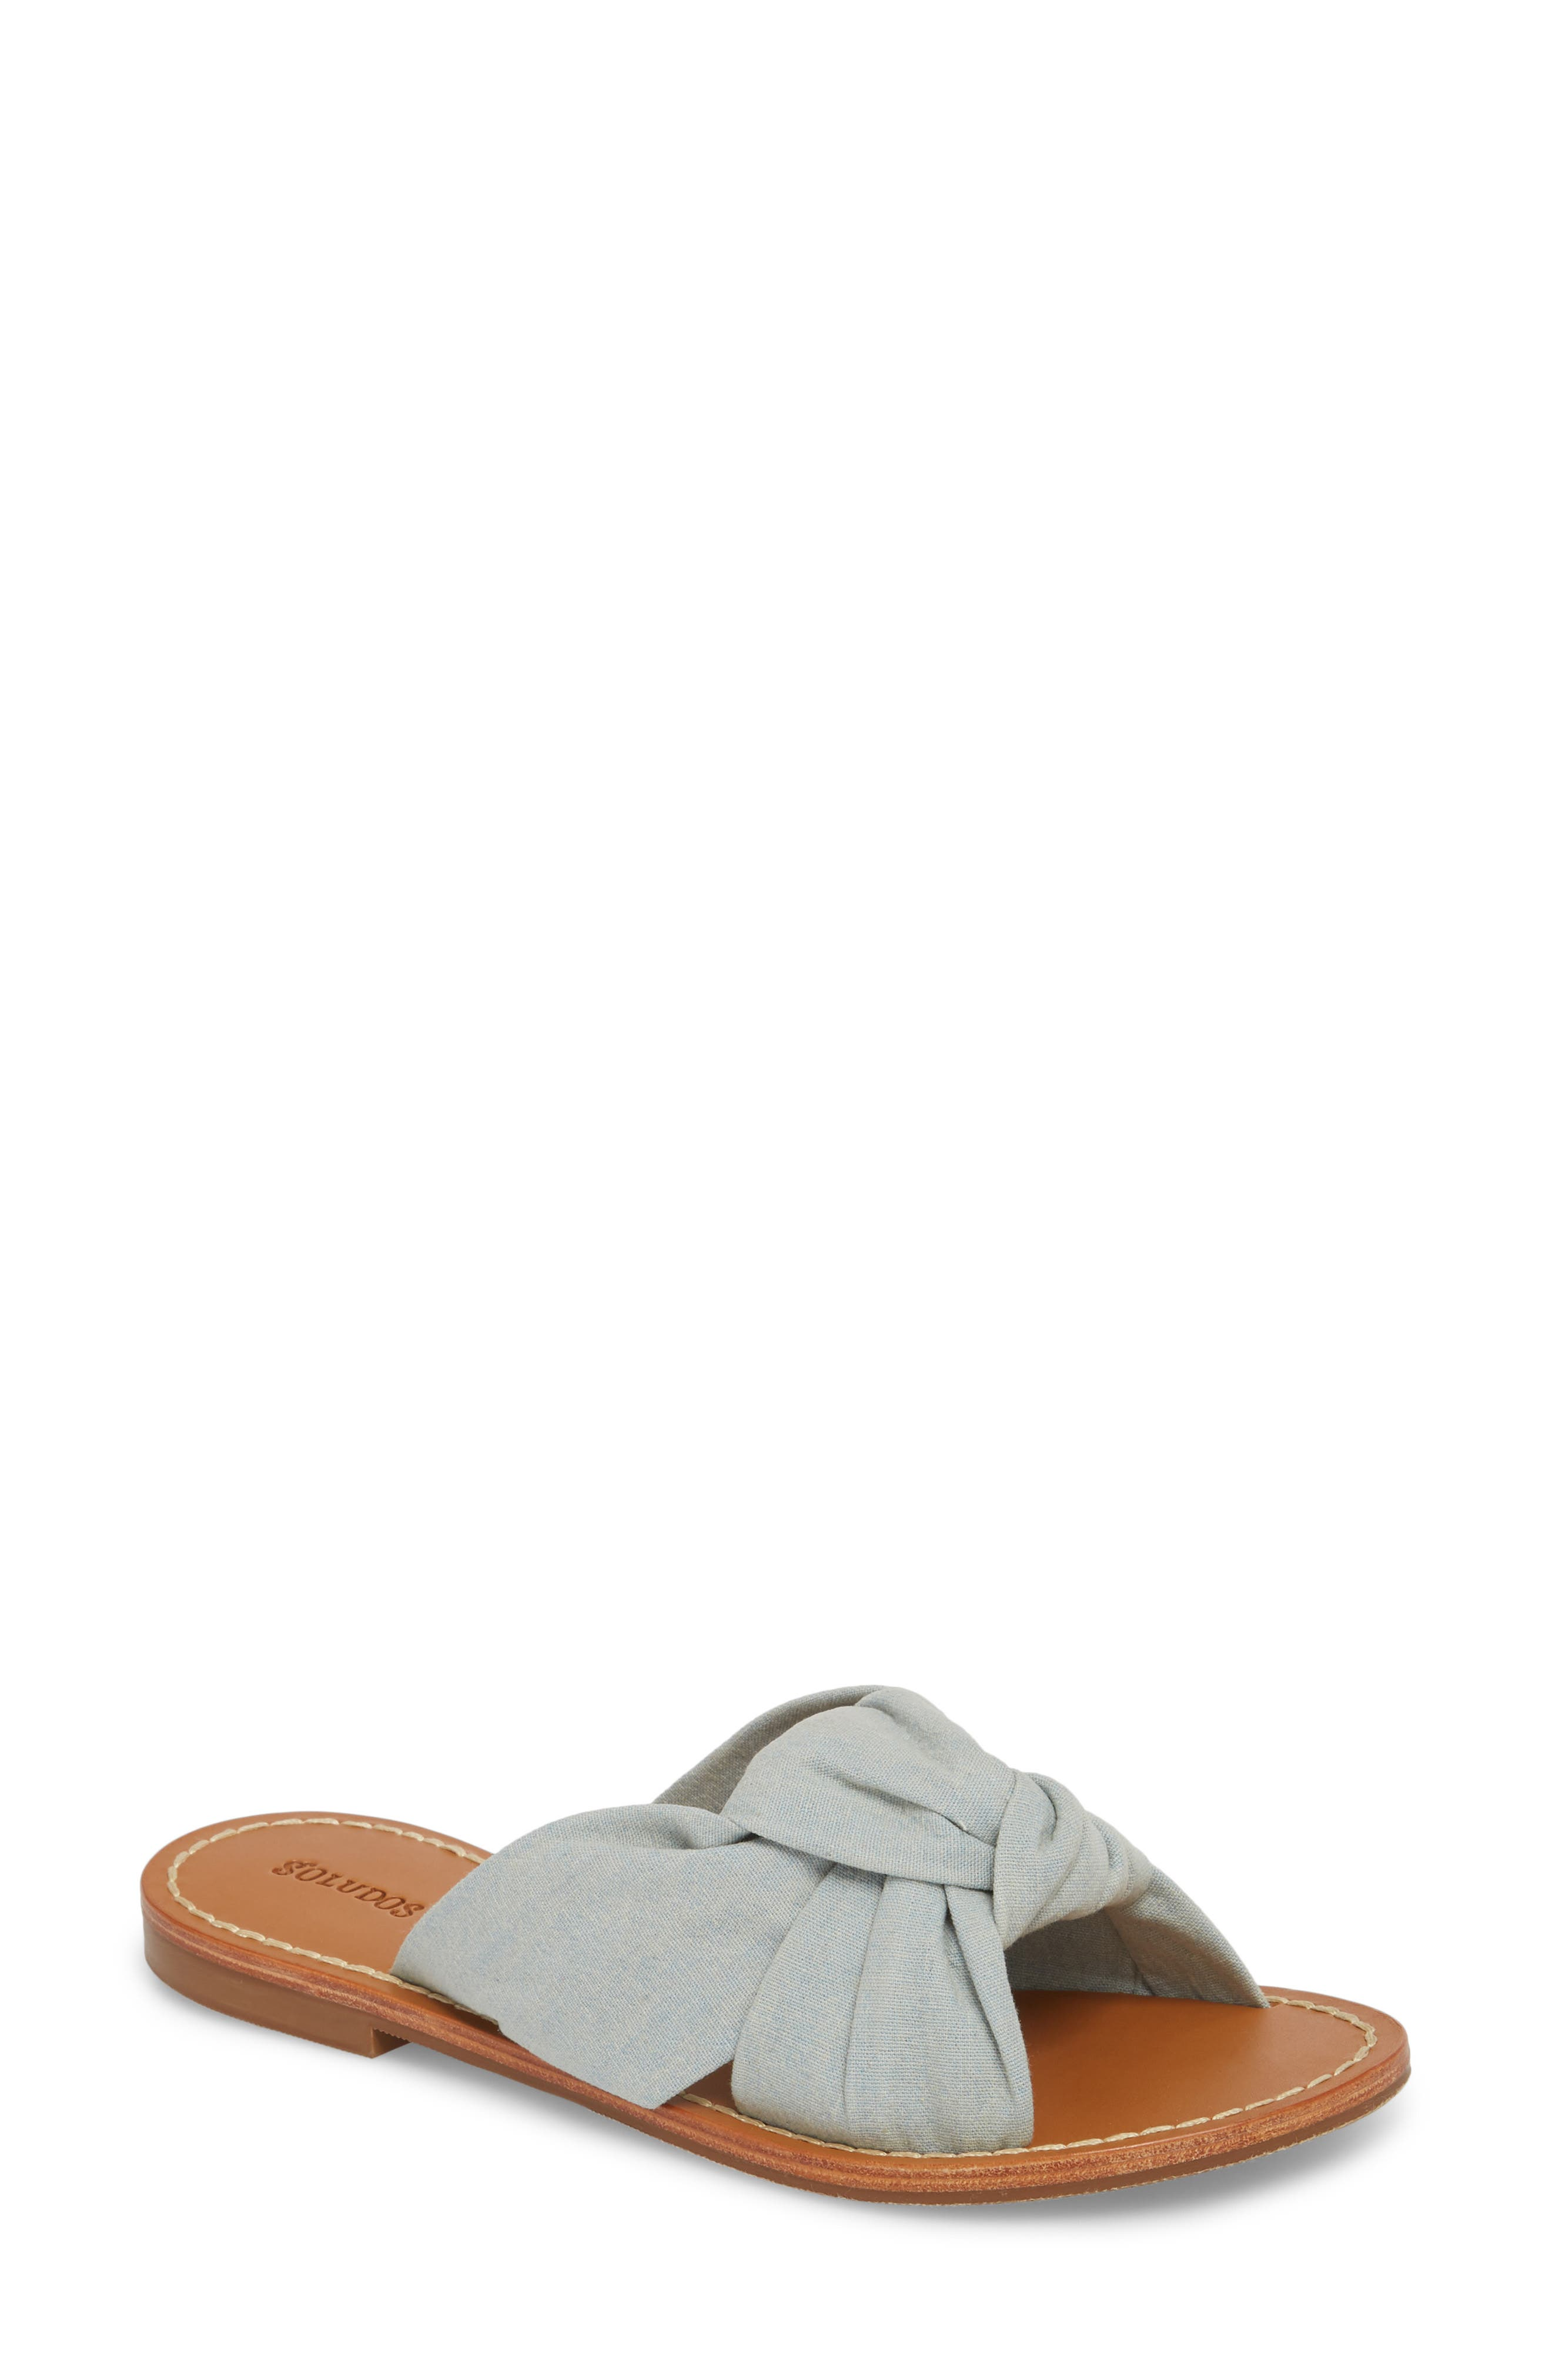 Knotted Slide Sandal,                             Main thumbnail 1, color,                             420